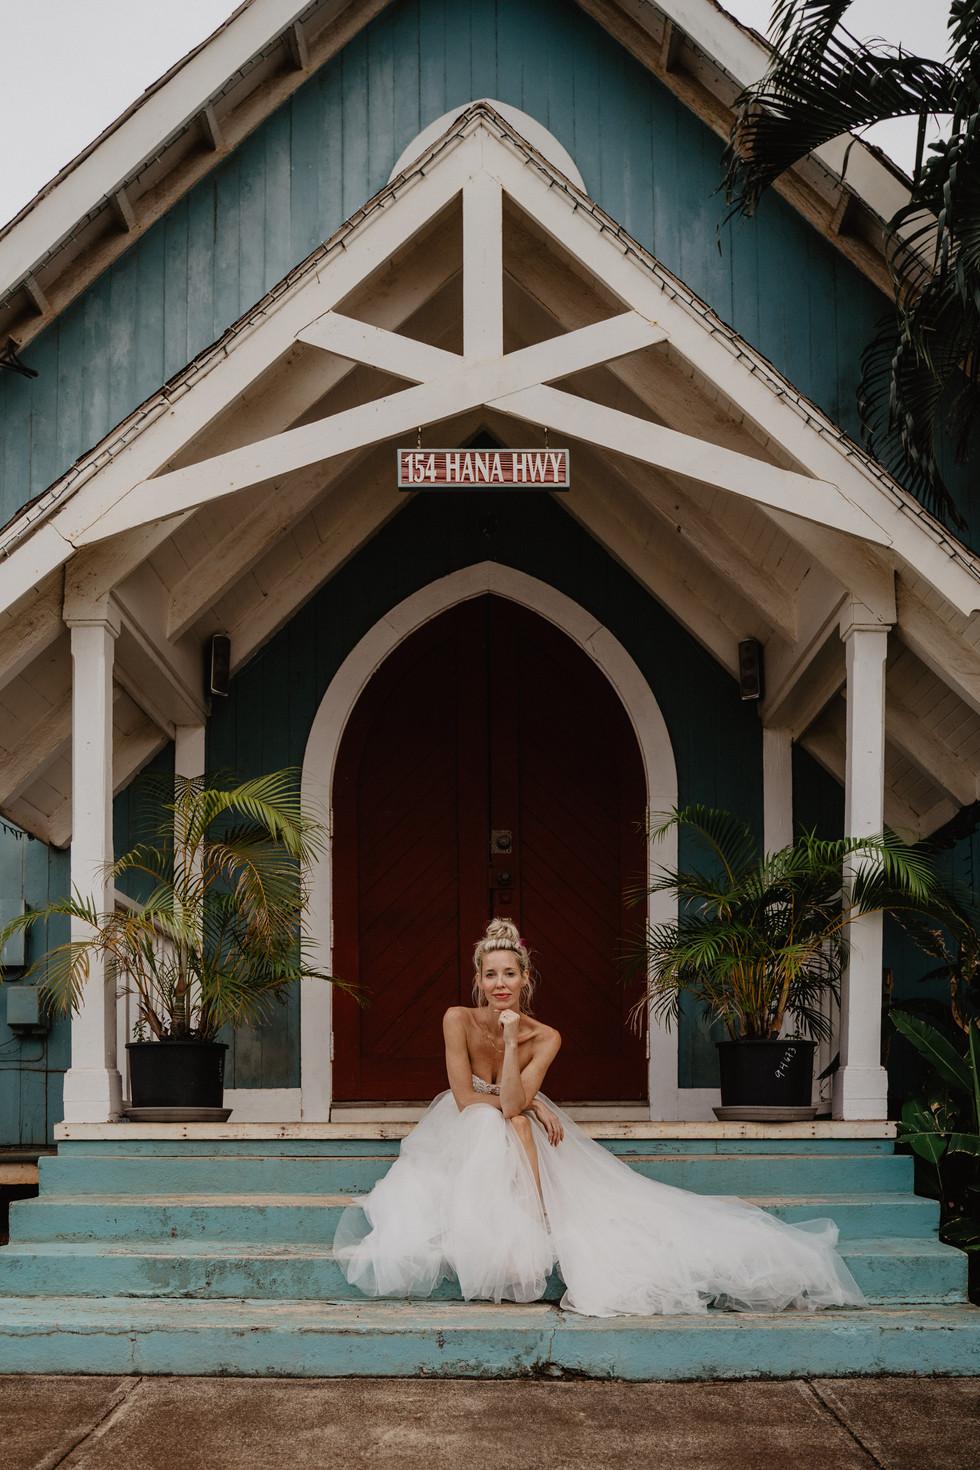 Wedding photographer Maui, Hawaii